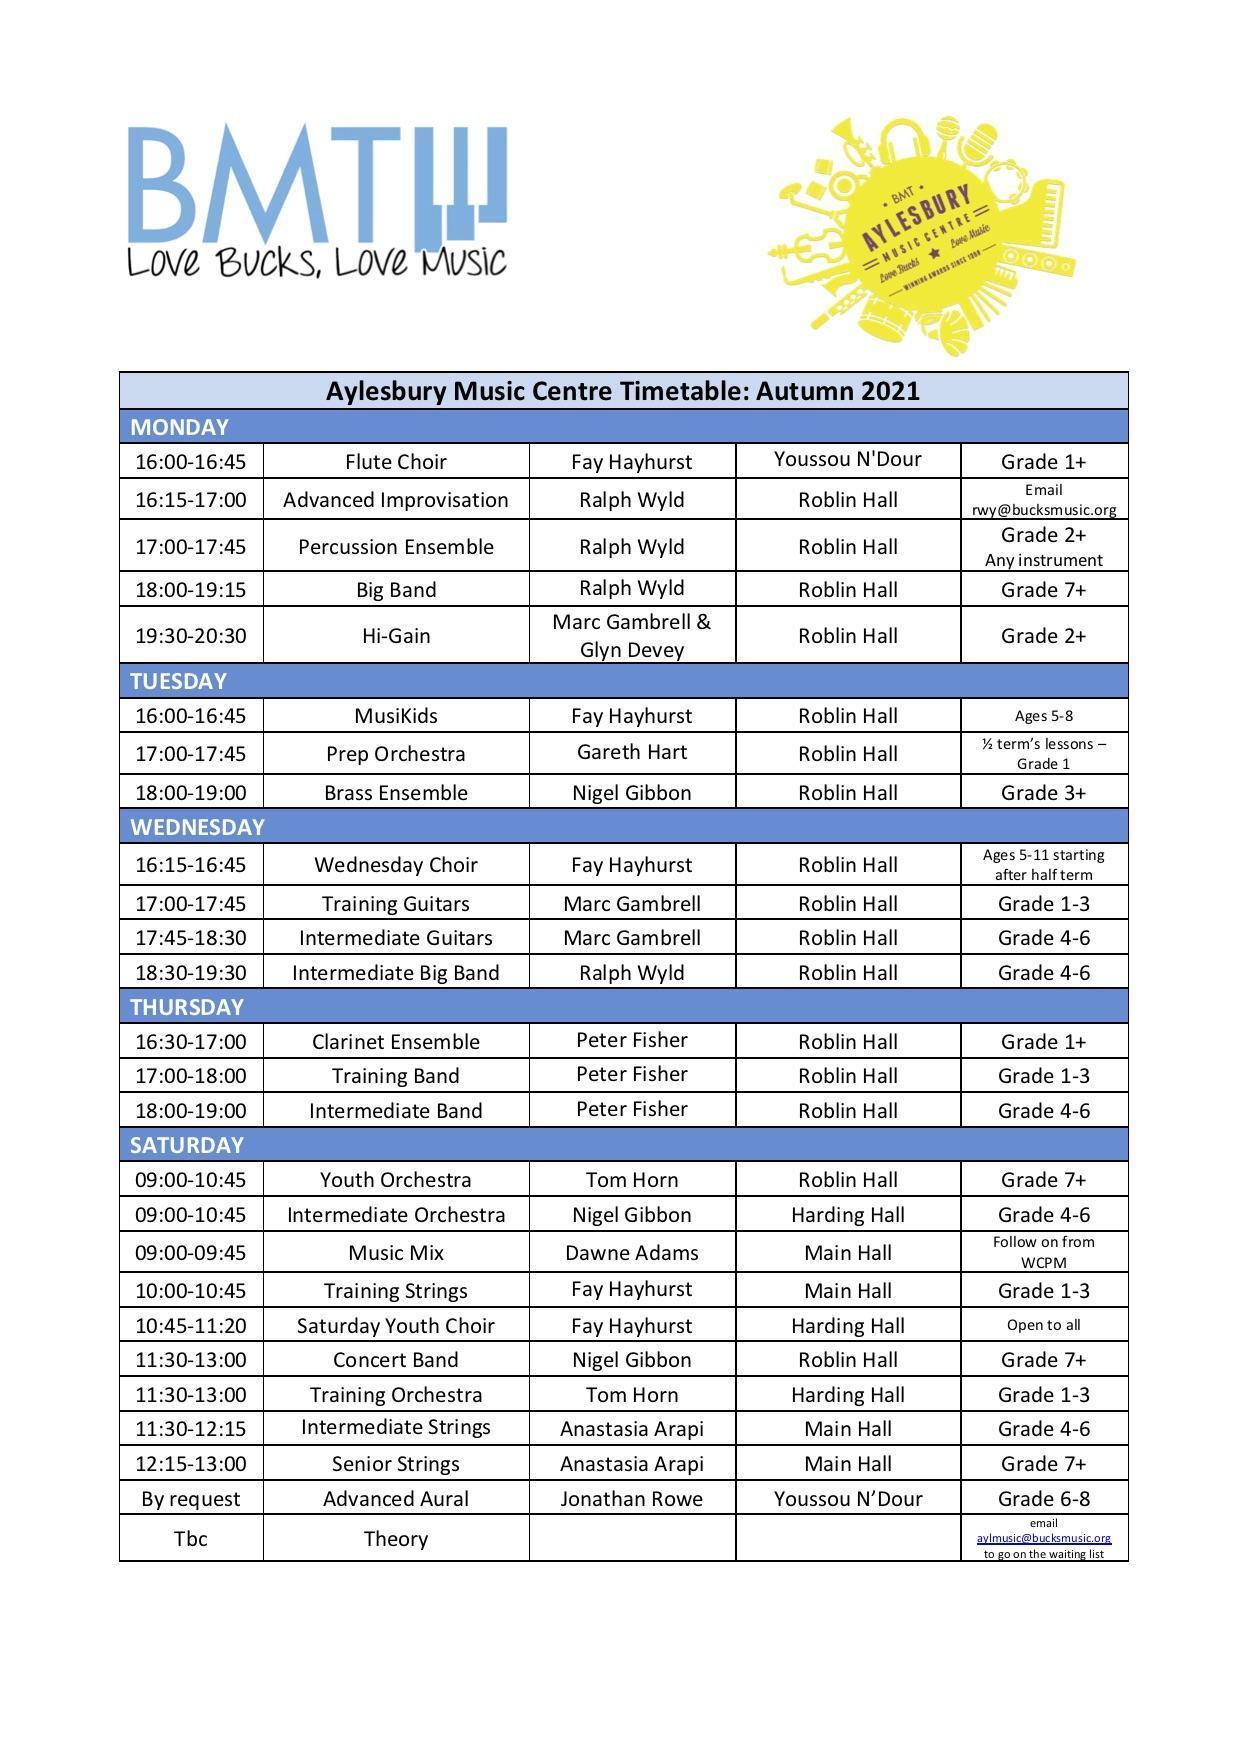 AyMC Centre Timetable Autumn 2021